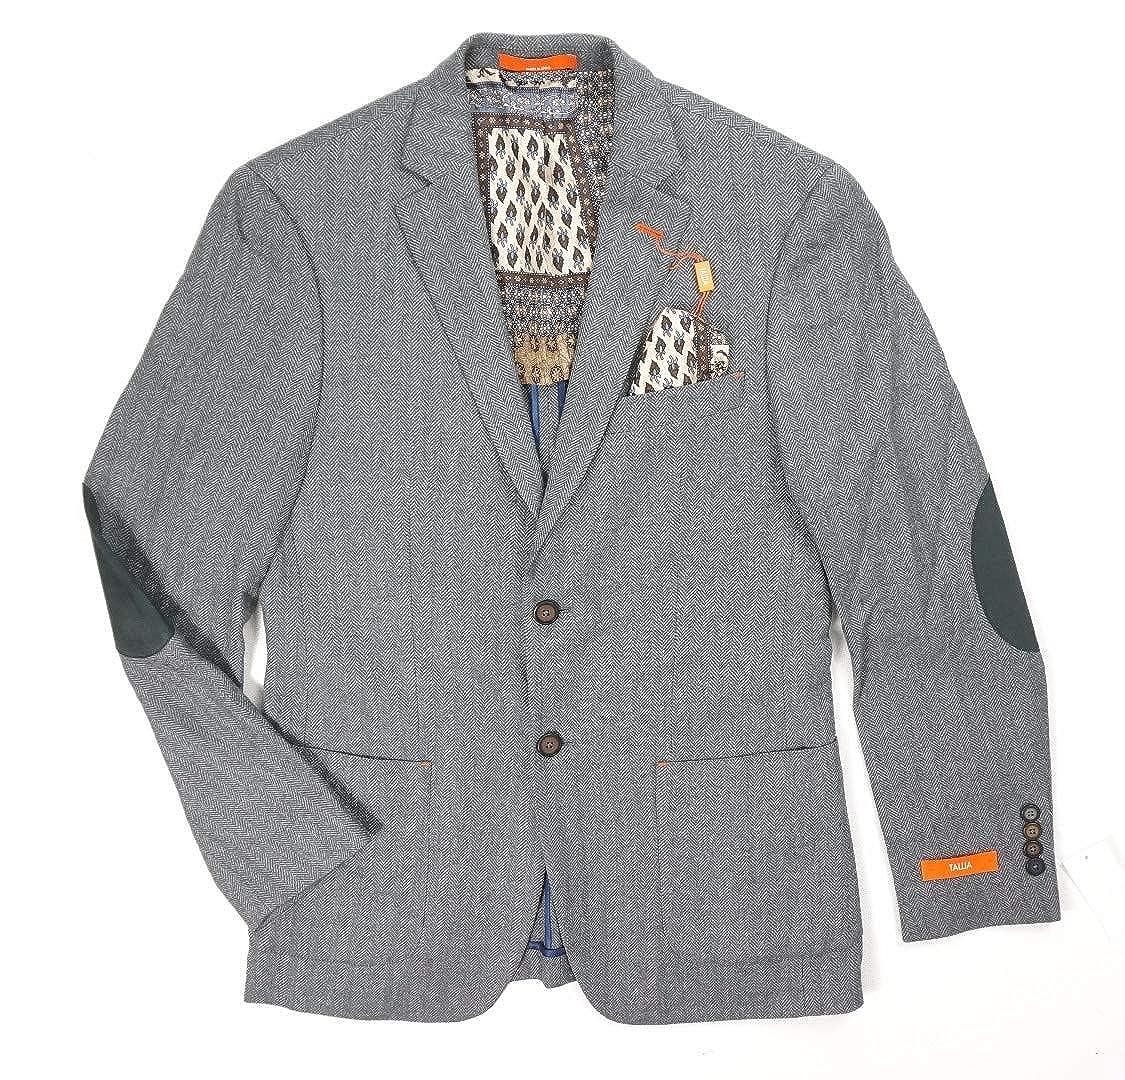 e763bda7b New $350 Tallia Orange Wool Gray Herringbone Sport Coat Elbow Patch ...